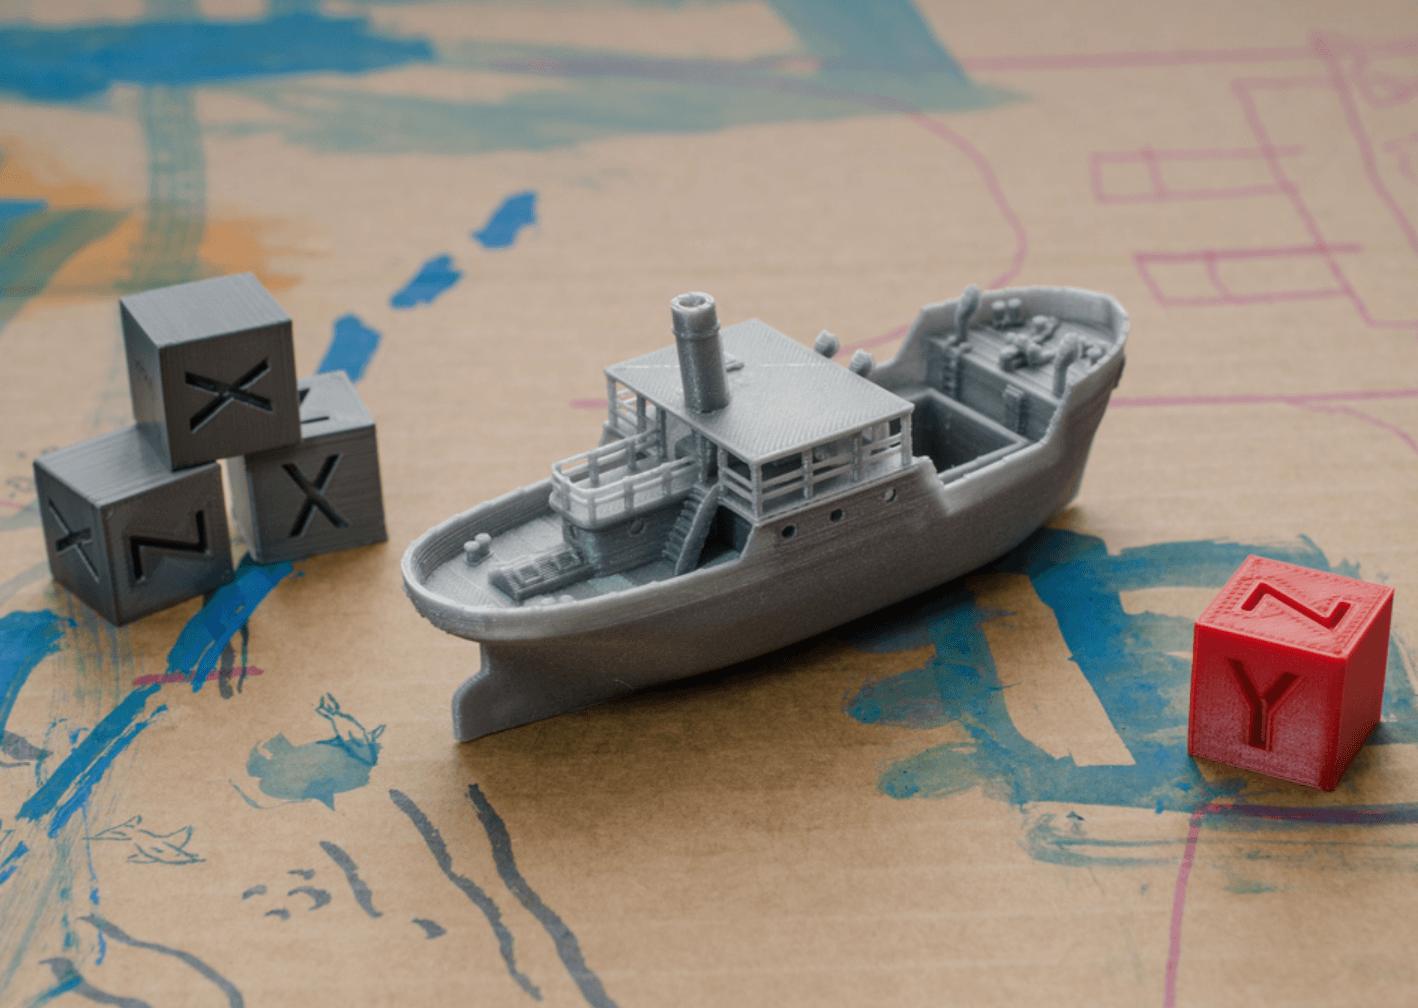 Capture d'écran 2018-04-09 à 18.10.32.png Download free STL file CAS - the modular xyz-cube cargo ship • 3D printing template, vandragon_de